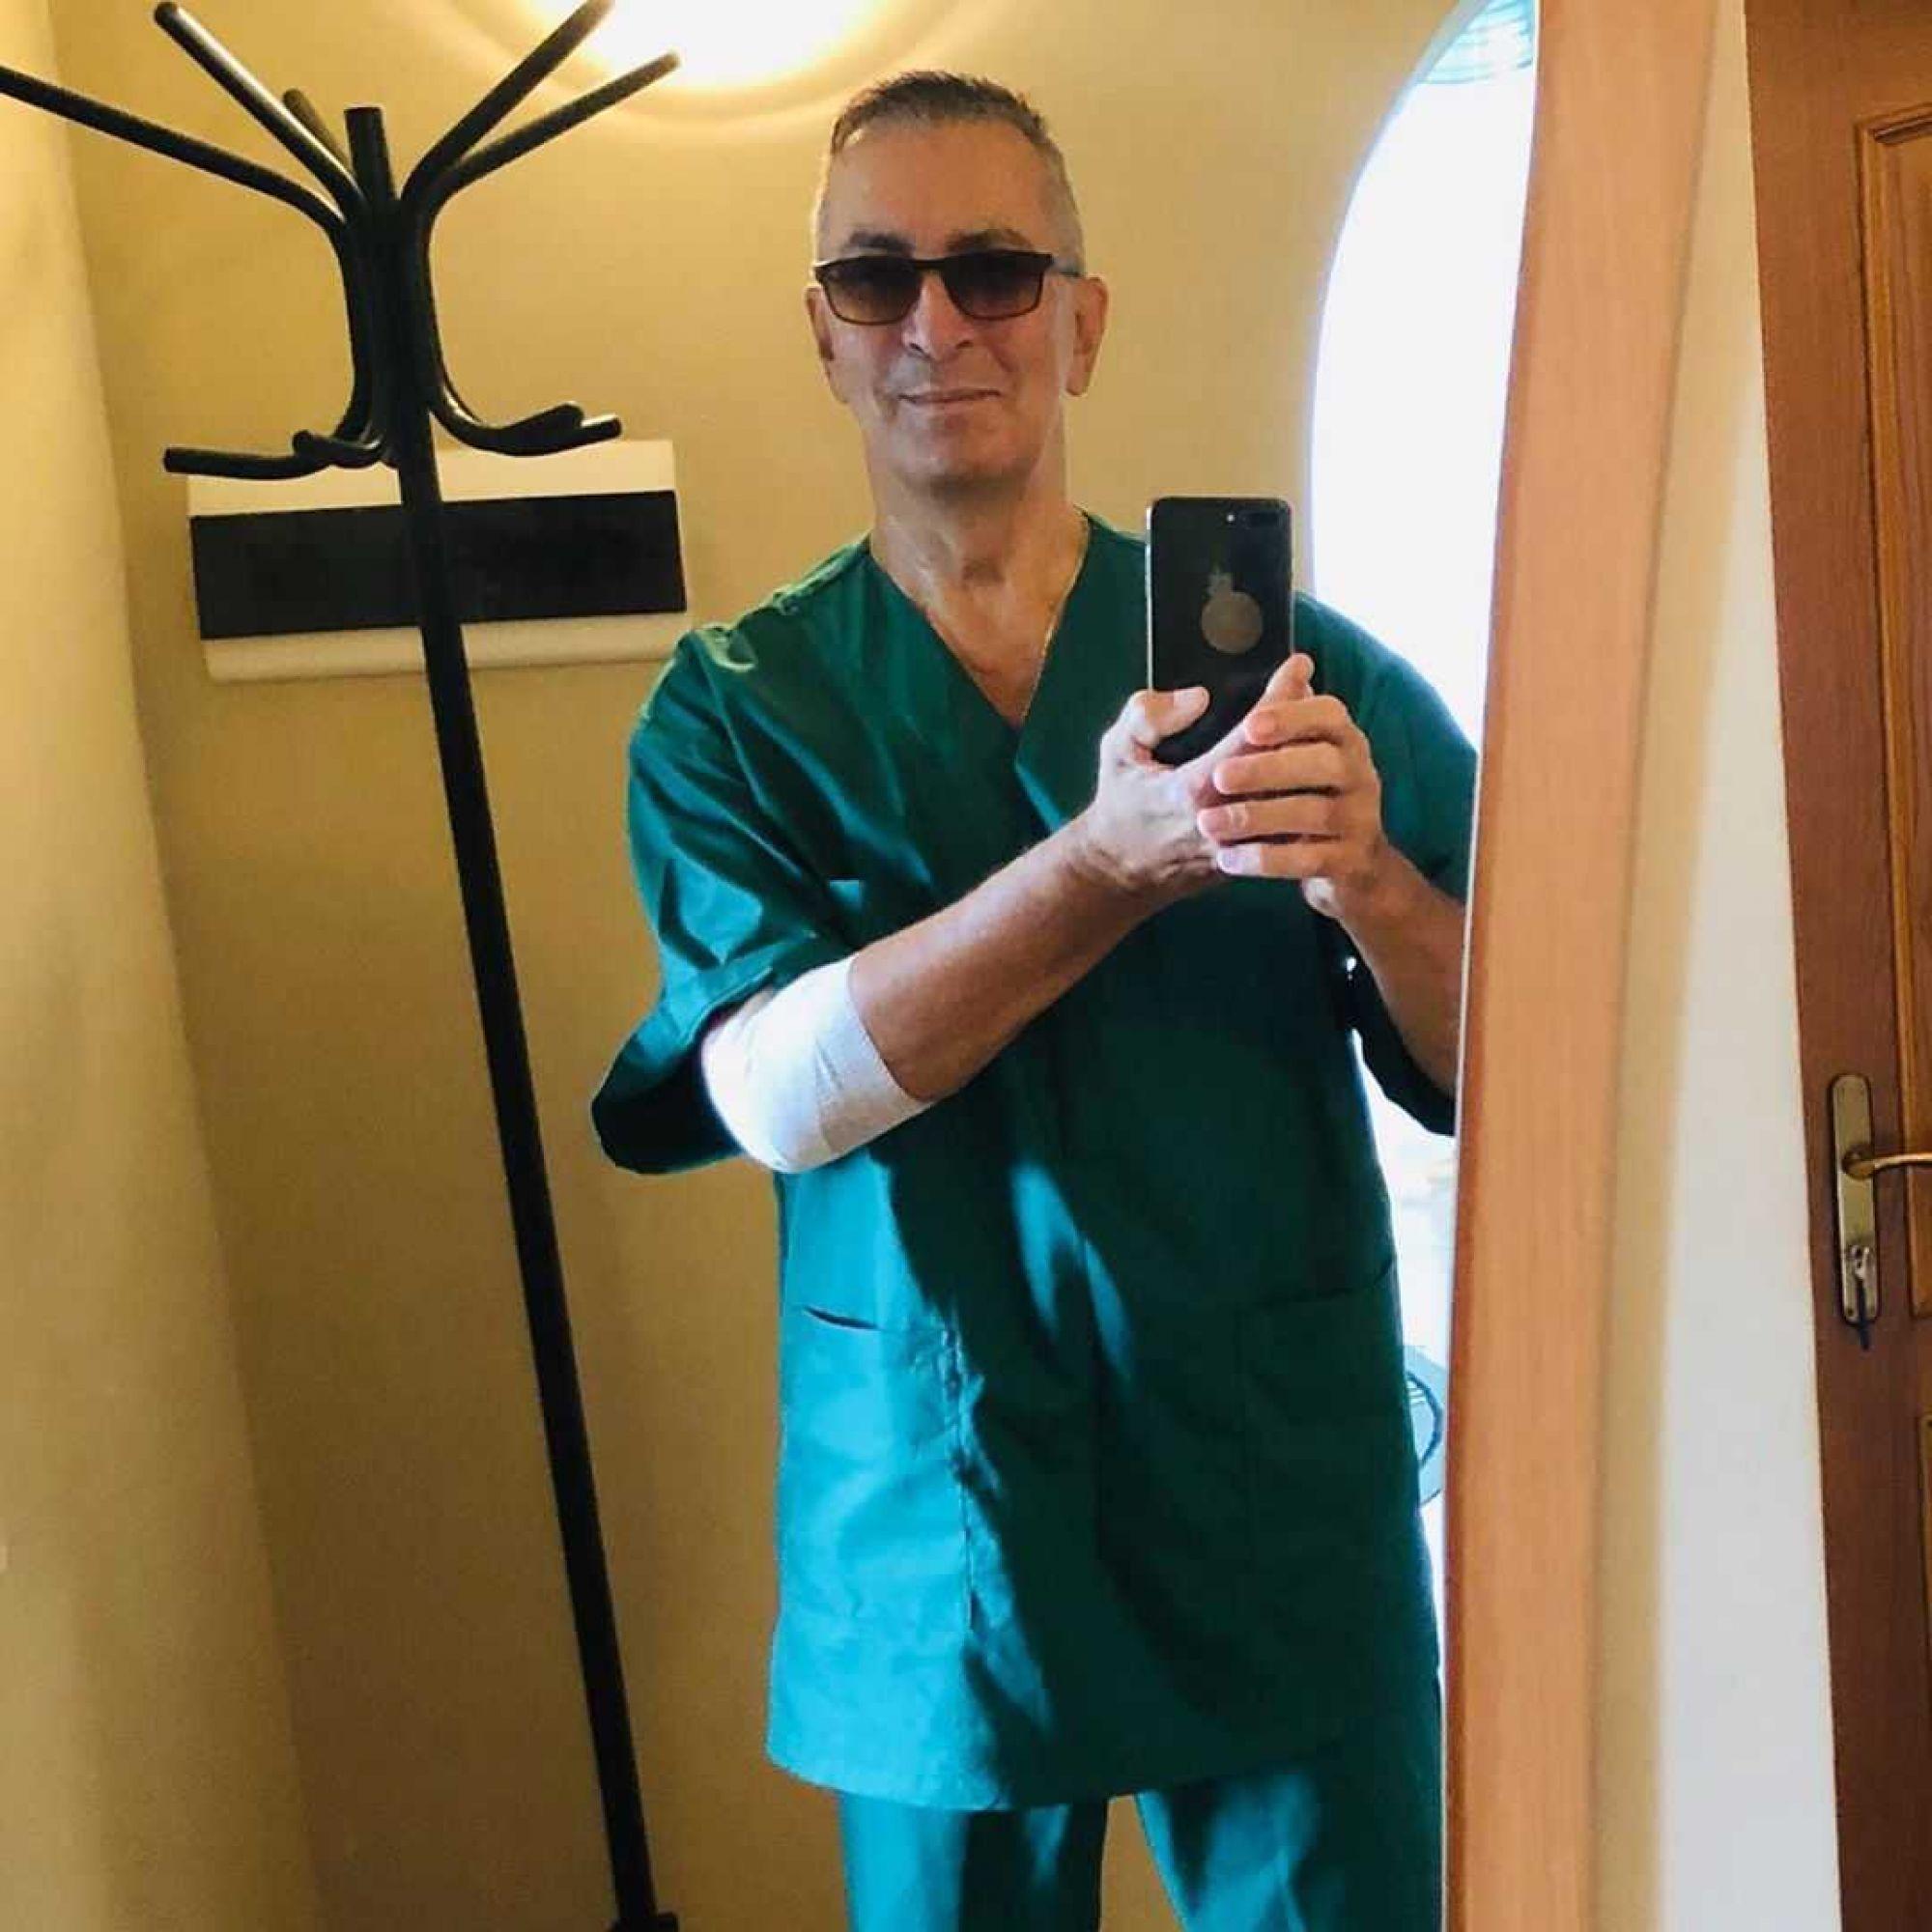 Шокирующие снимки Александра Буйнова после операции испугали фанатов